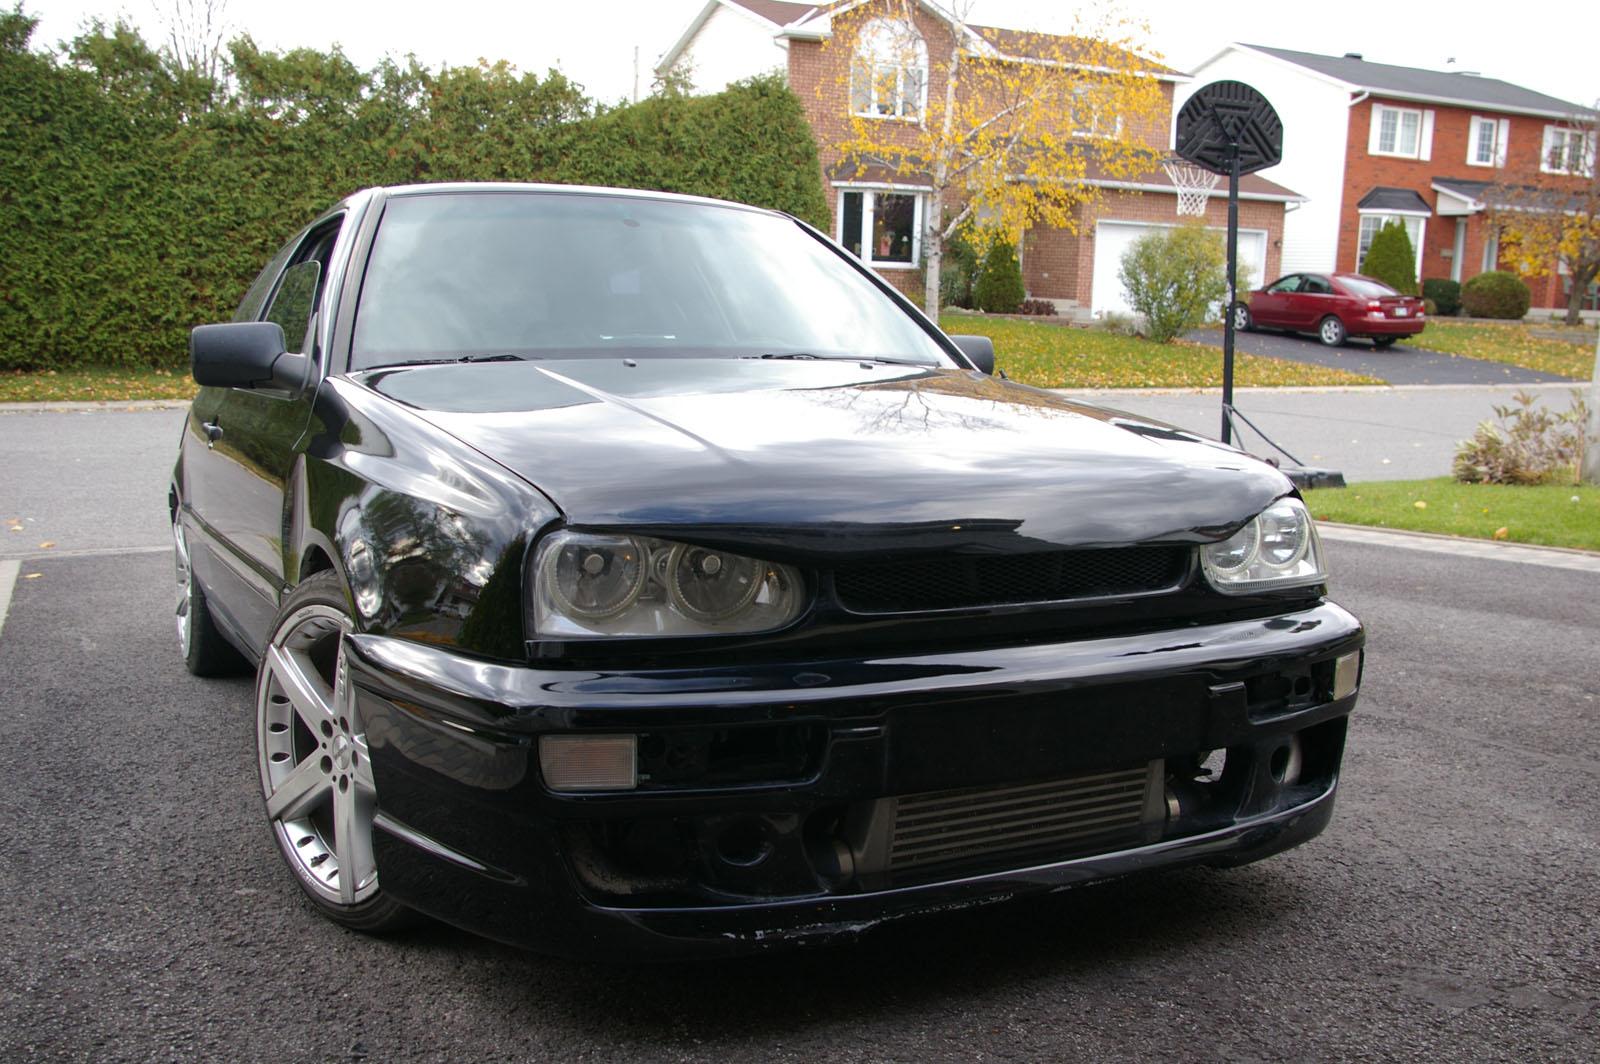 1997 Volkswagen Golf gti For Sale